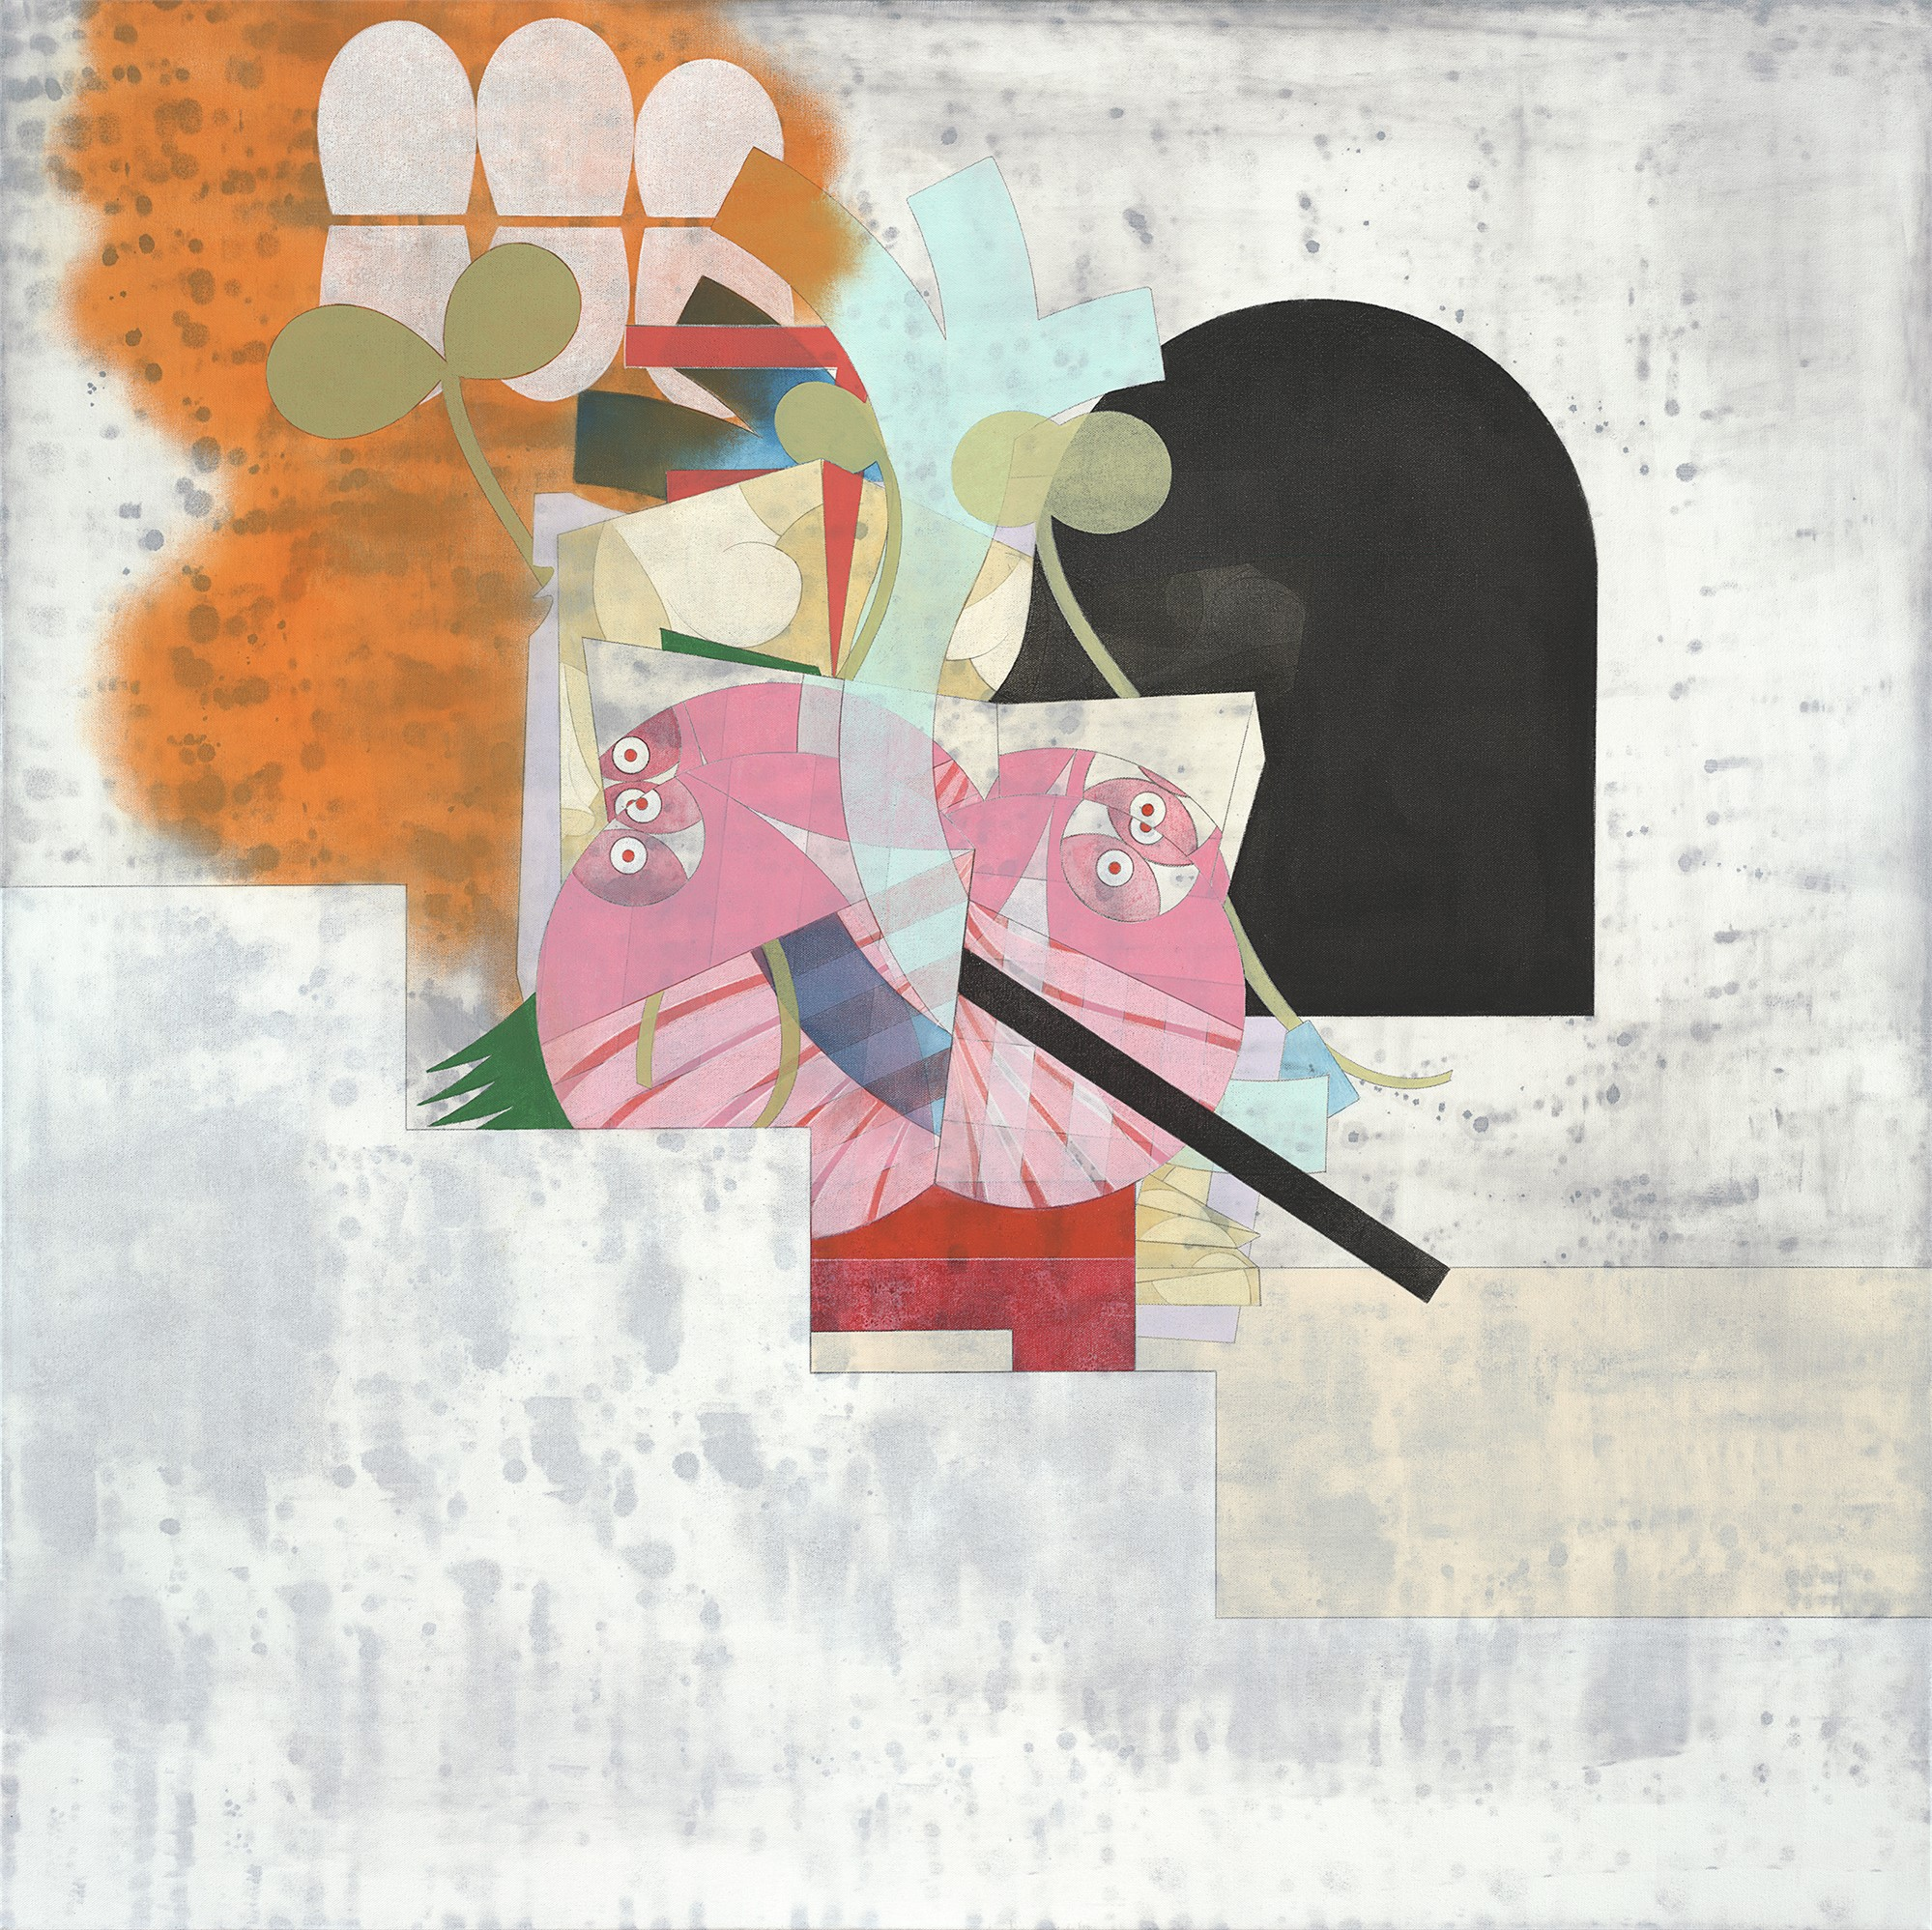 Varun by Kuzana Ogg